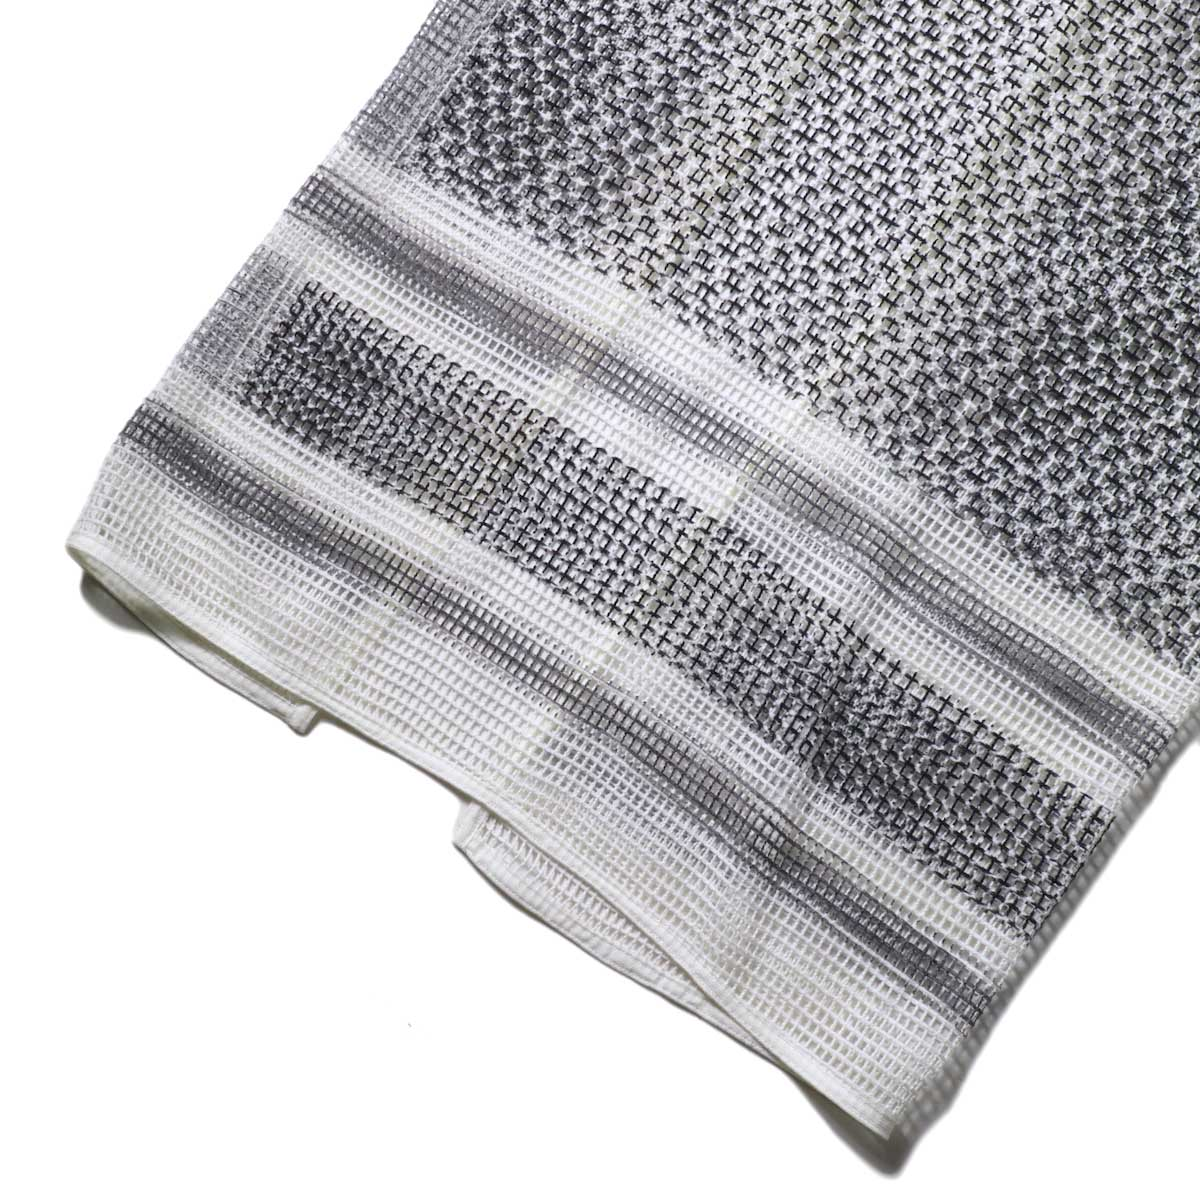 UNUSED / UW0967 cotton square mesh apron one piece 裾